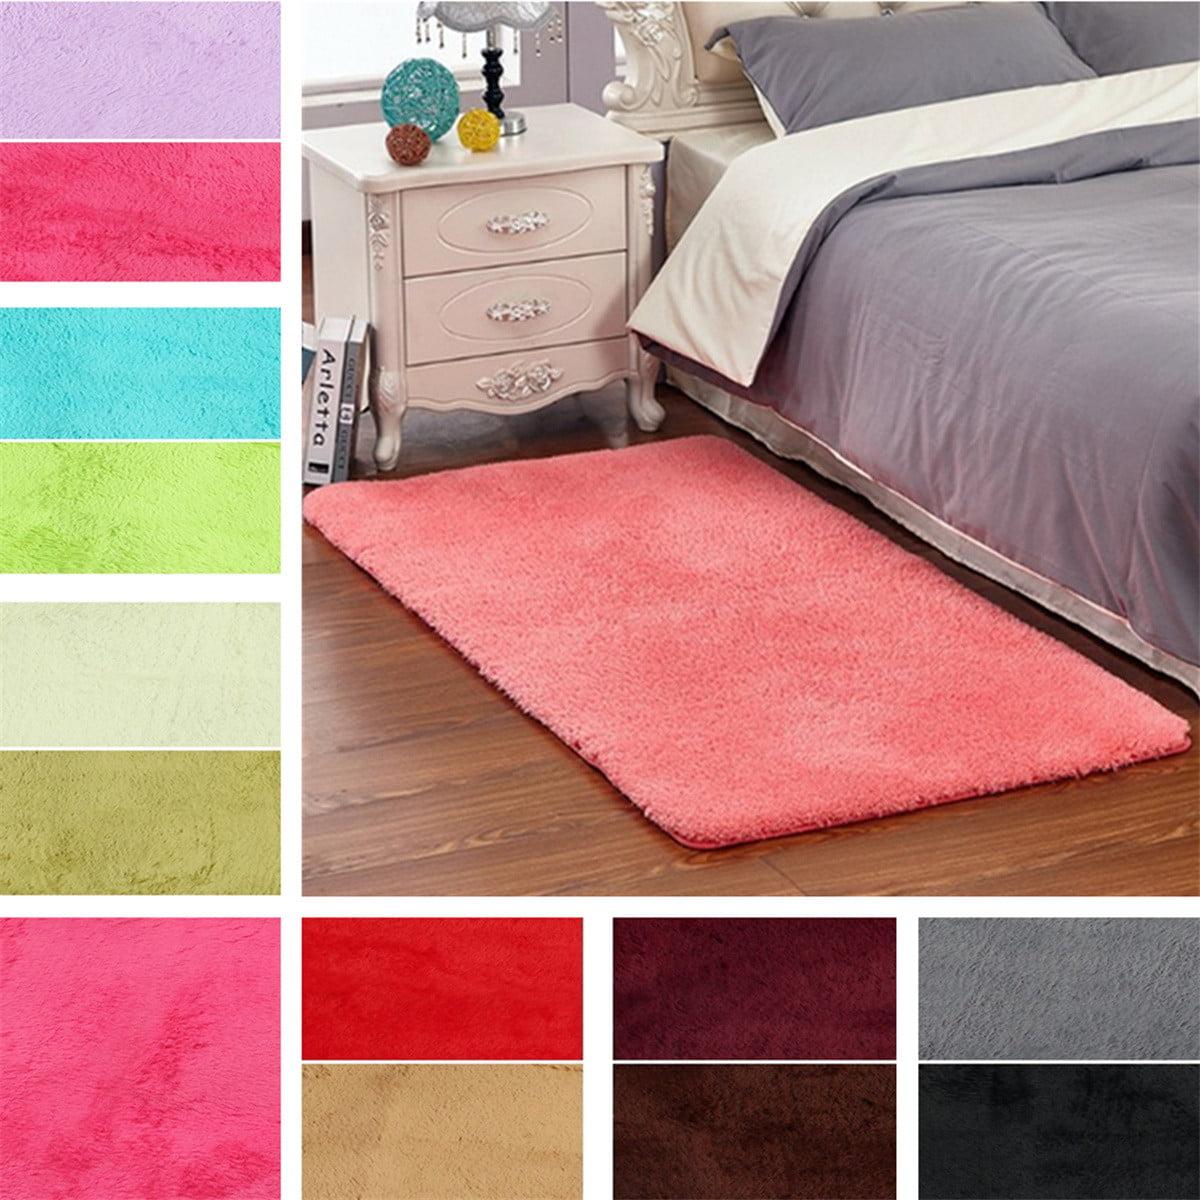 Fluffy Rectangle Floor  Rug Anti-skid Shaggy Area Rug Dining Room Carpet Yoga Bedroom Floor Mat / Cover Child Play Mat Parlor Bedroom Decor ❤ 60x120cm ❤13 colors❤